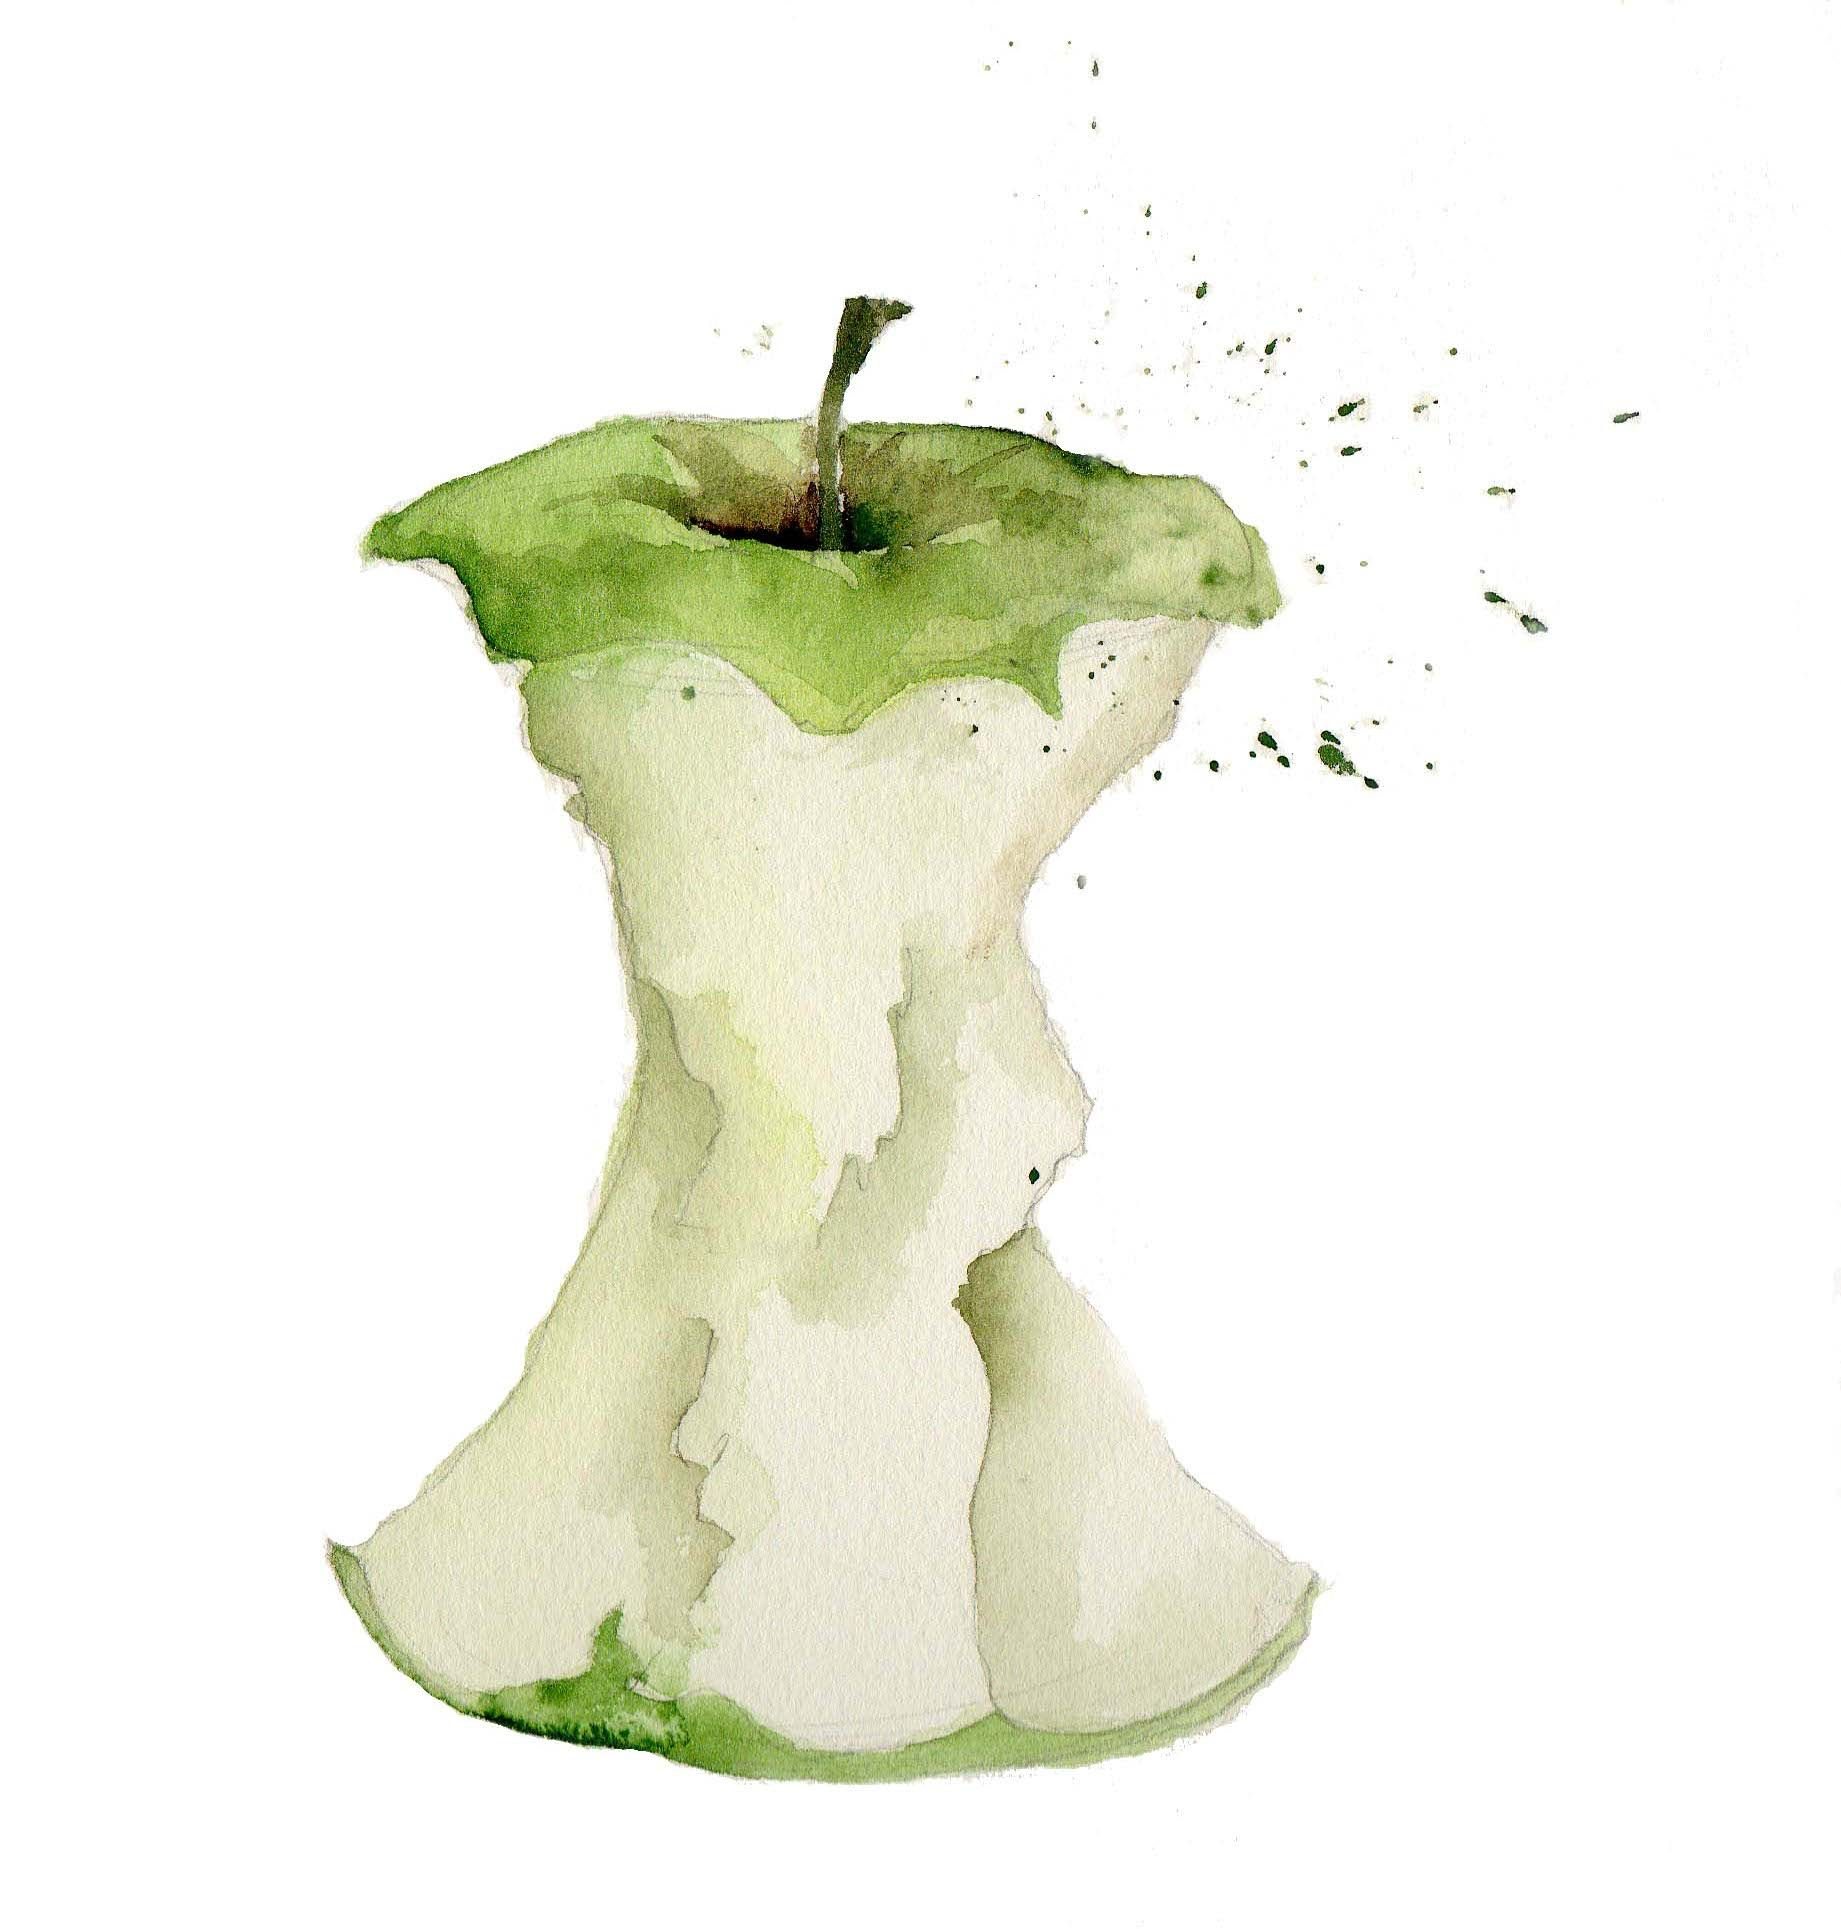 Watercolour illustration of apple core by Jill Mercer